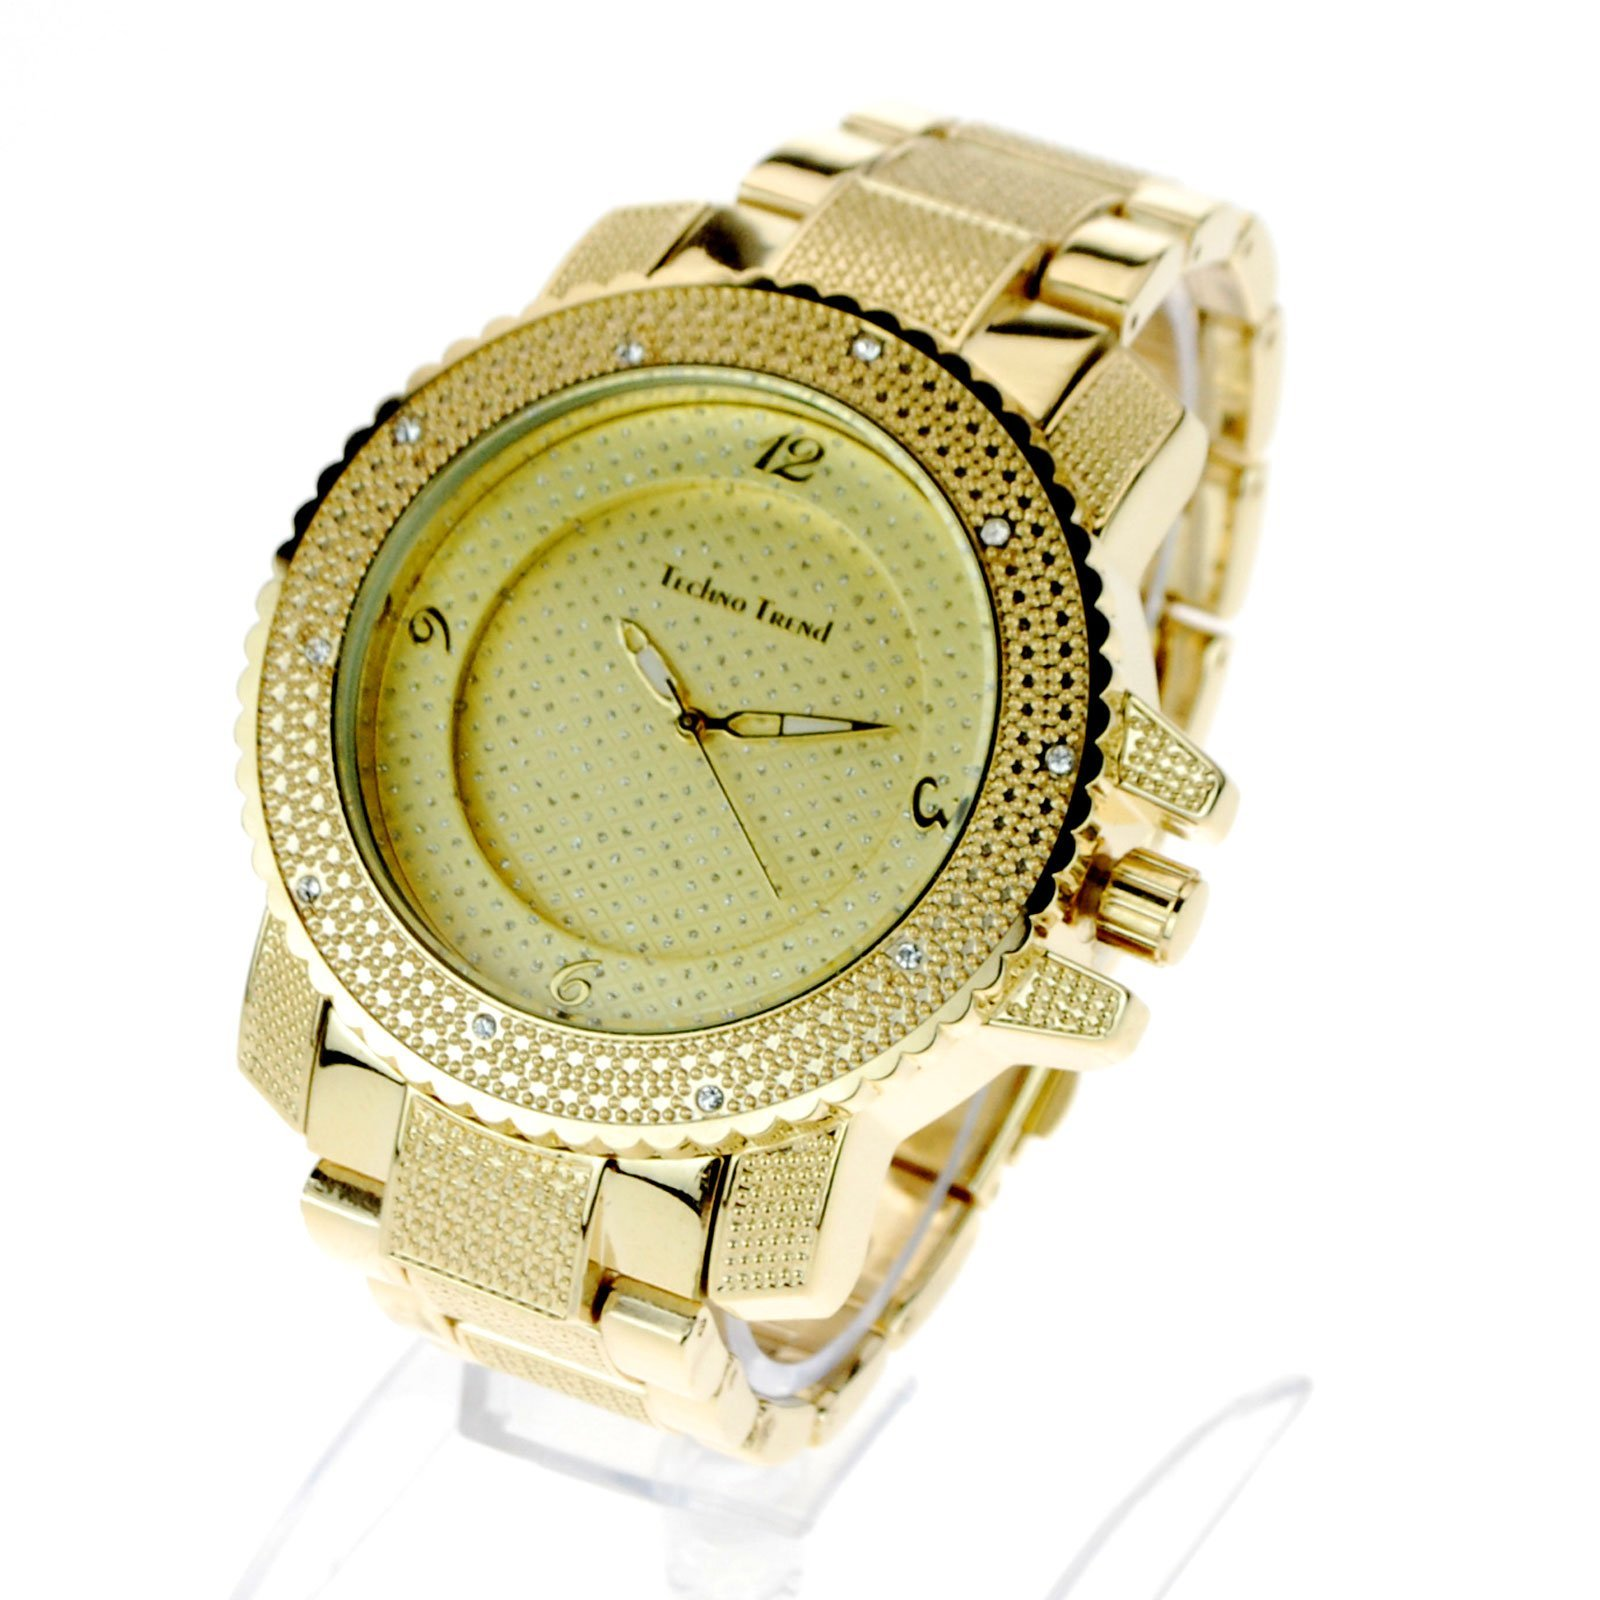 72f7b57eb55e Techno Mens Hip Hop Iced Out Luxury Baller Diamond Bezel Analog Wristwatch  Gold